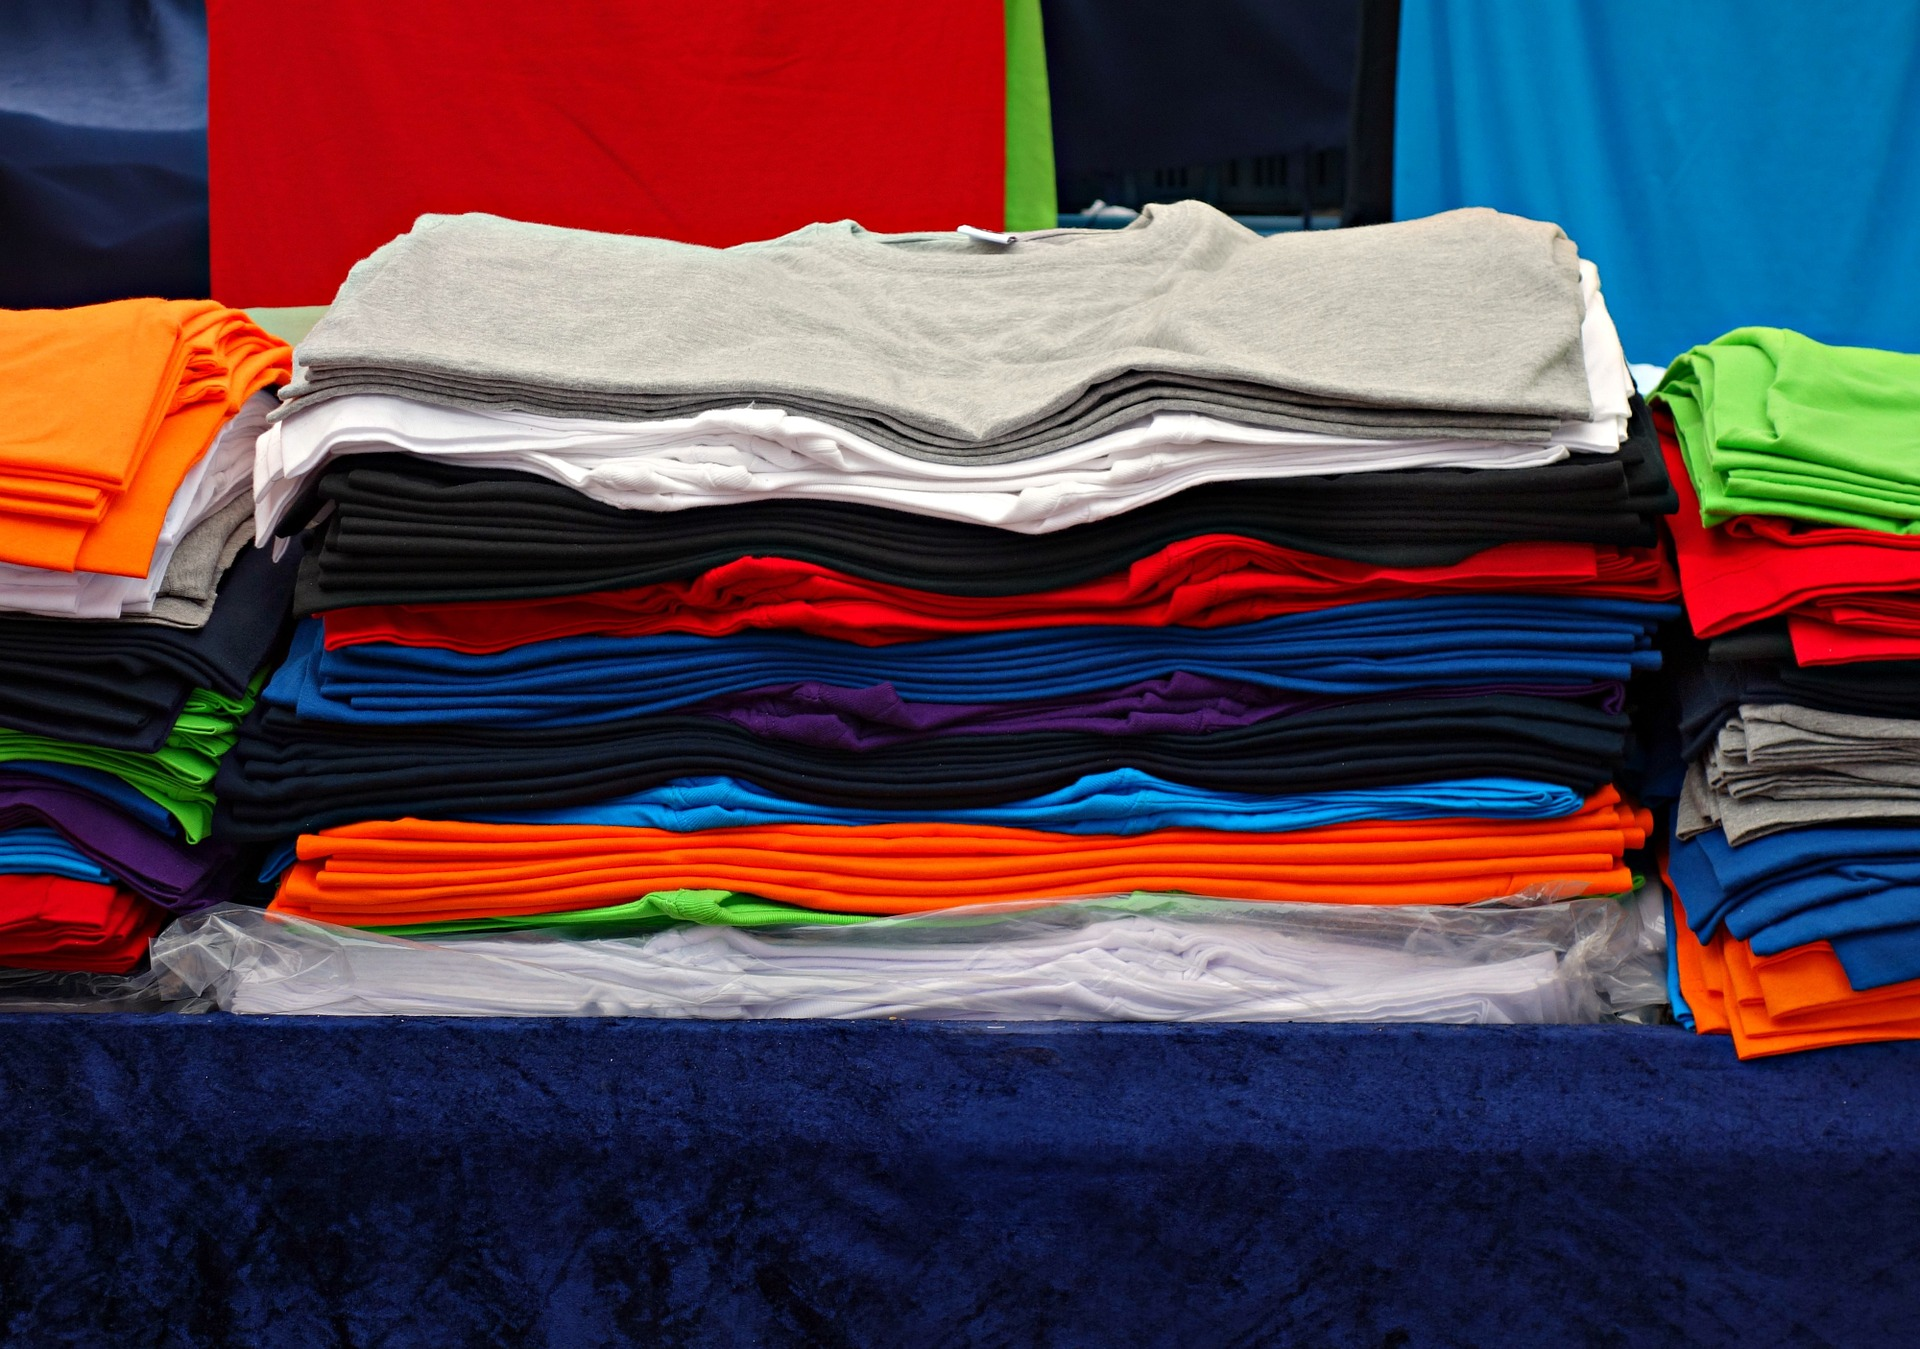 Ideas for Company T-Shirts